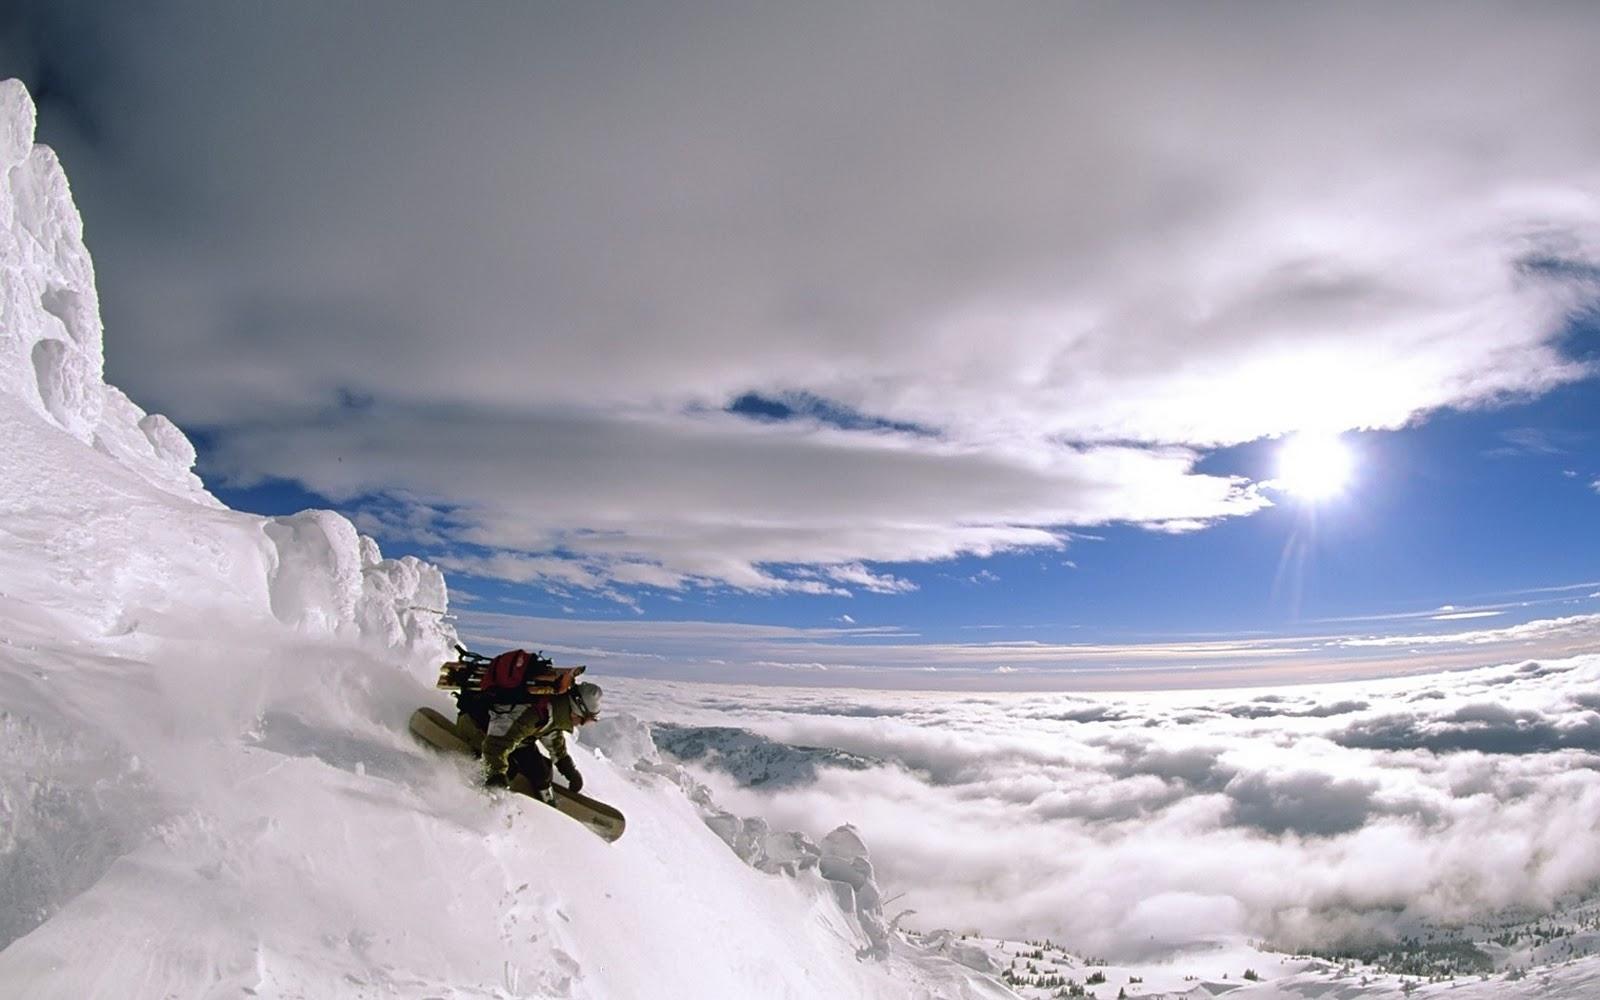 snowboarding wallpapers wallpaper - photo #47